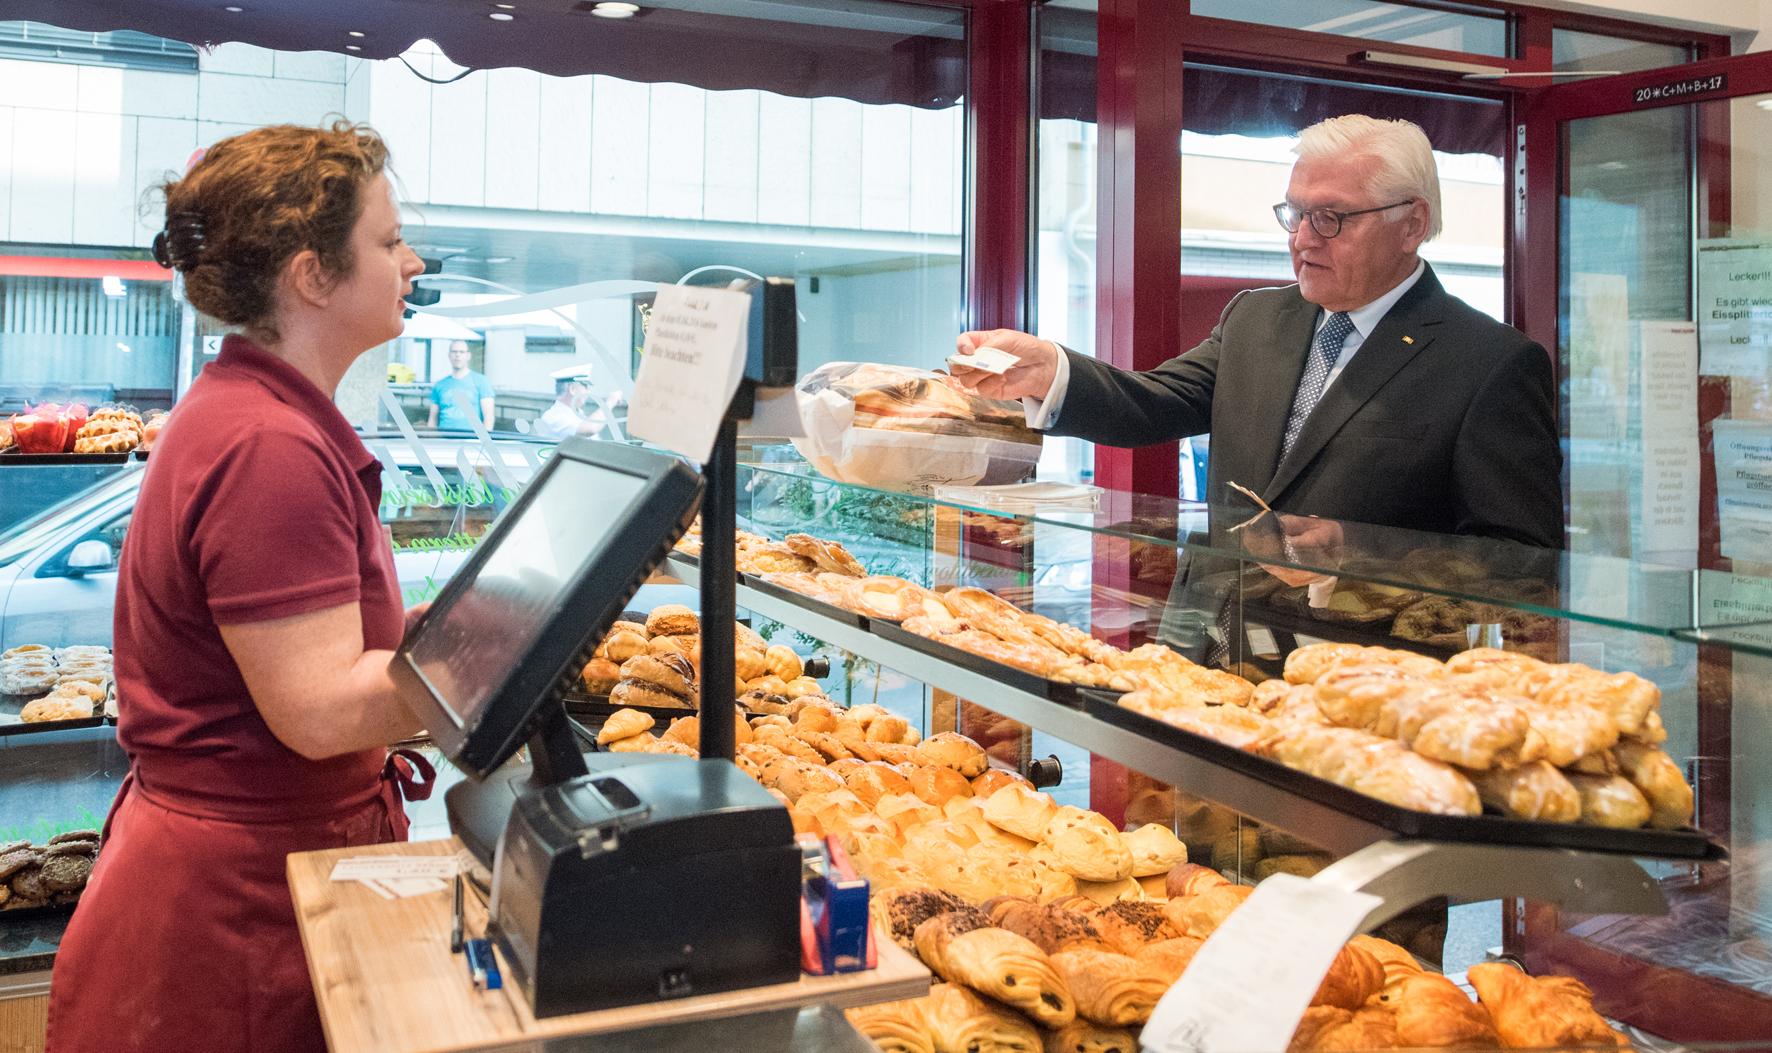 Bundespräsident beim Bäcker